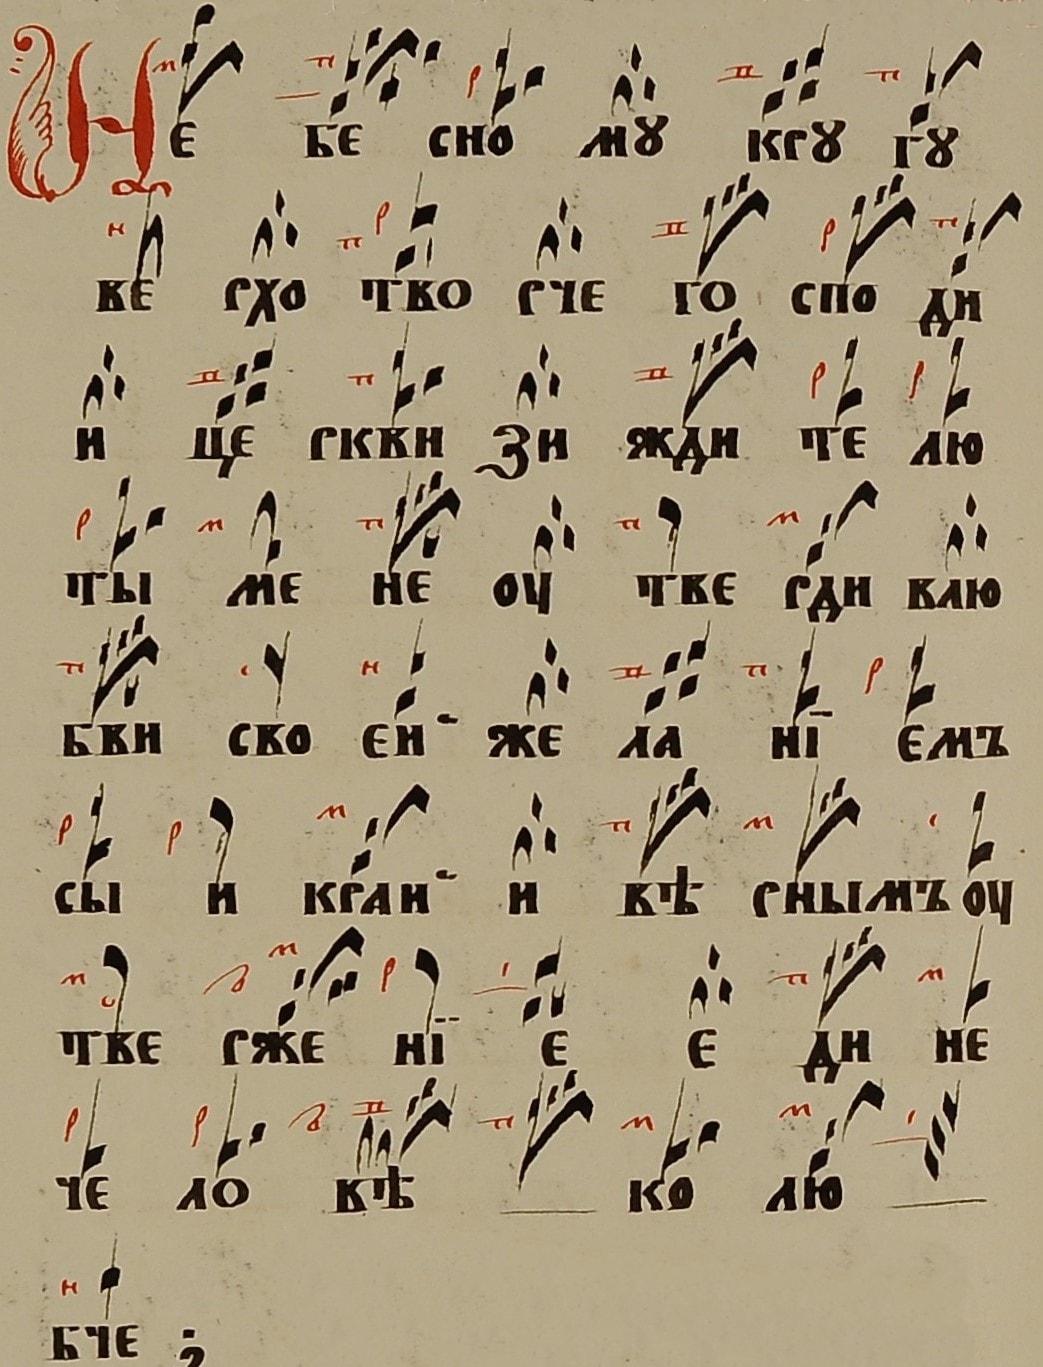 8 глас. Ирмос 3 песни. Небесному кругу. Преображение (2)-min